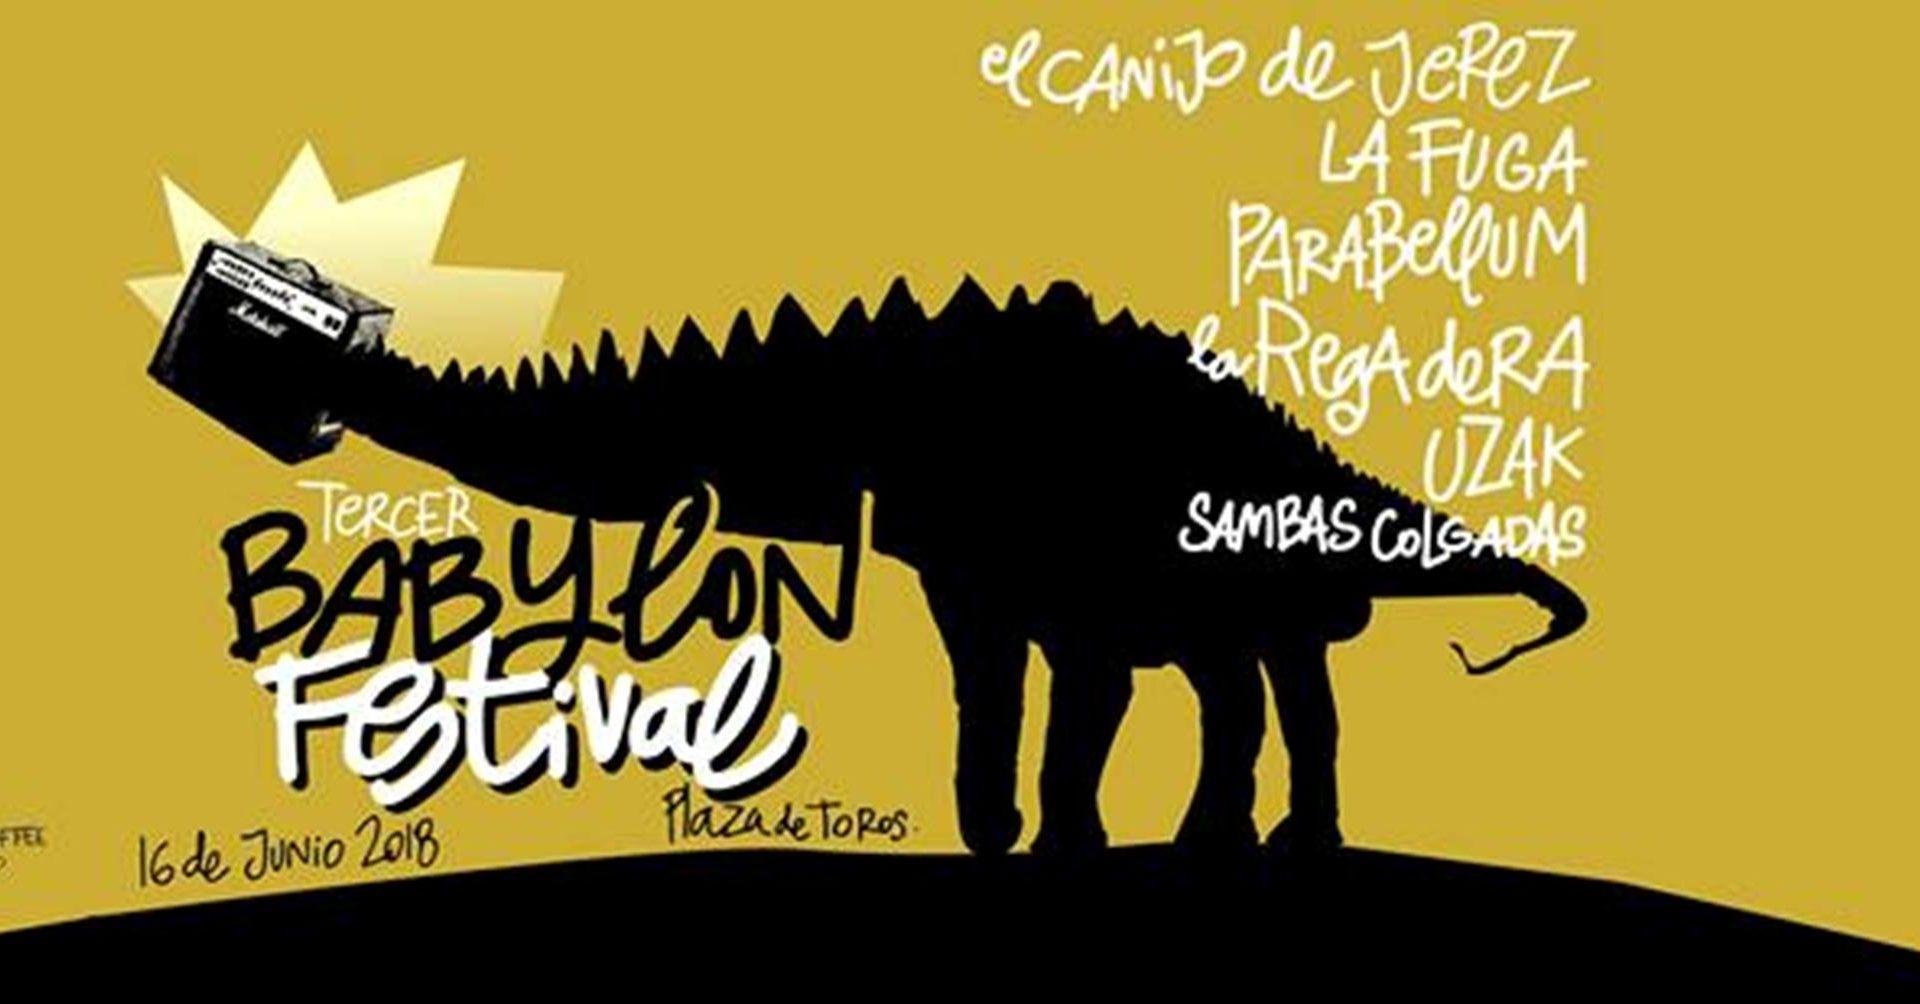 Permalink to: III BABYLON FESTIVAL